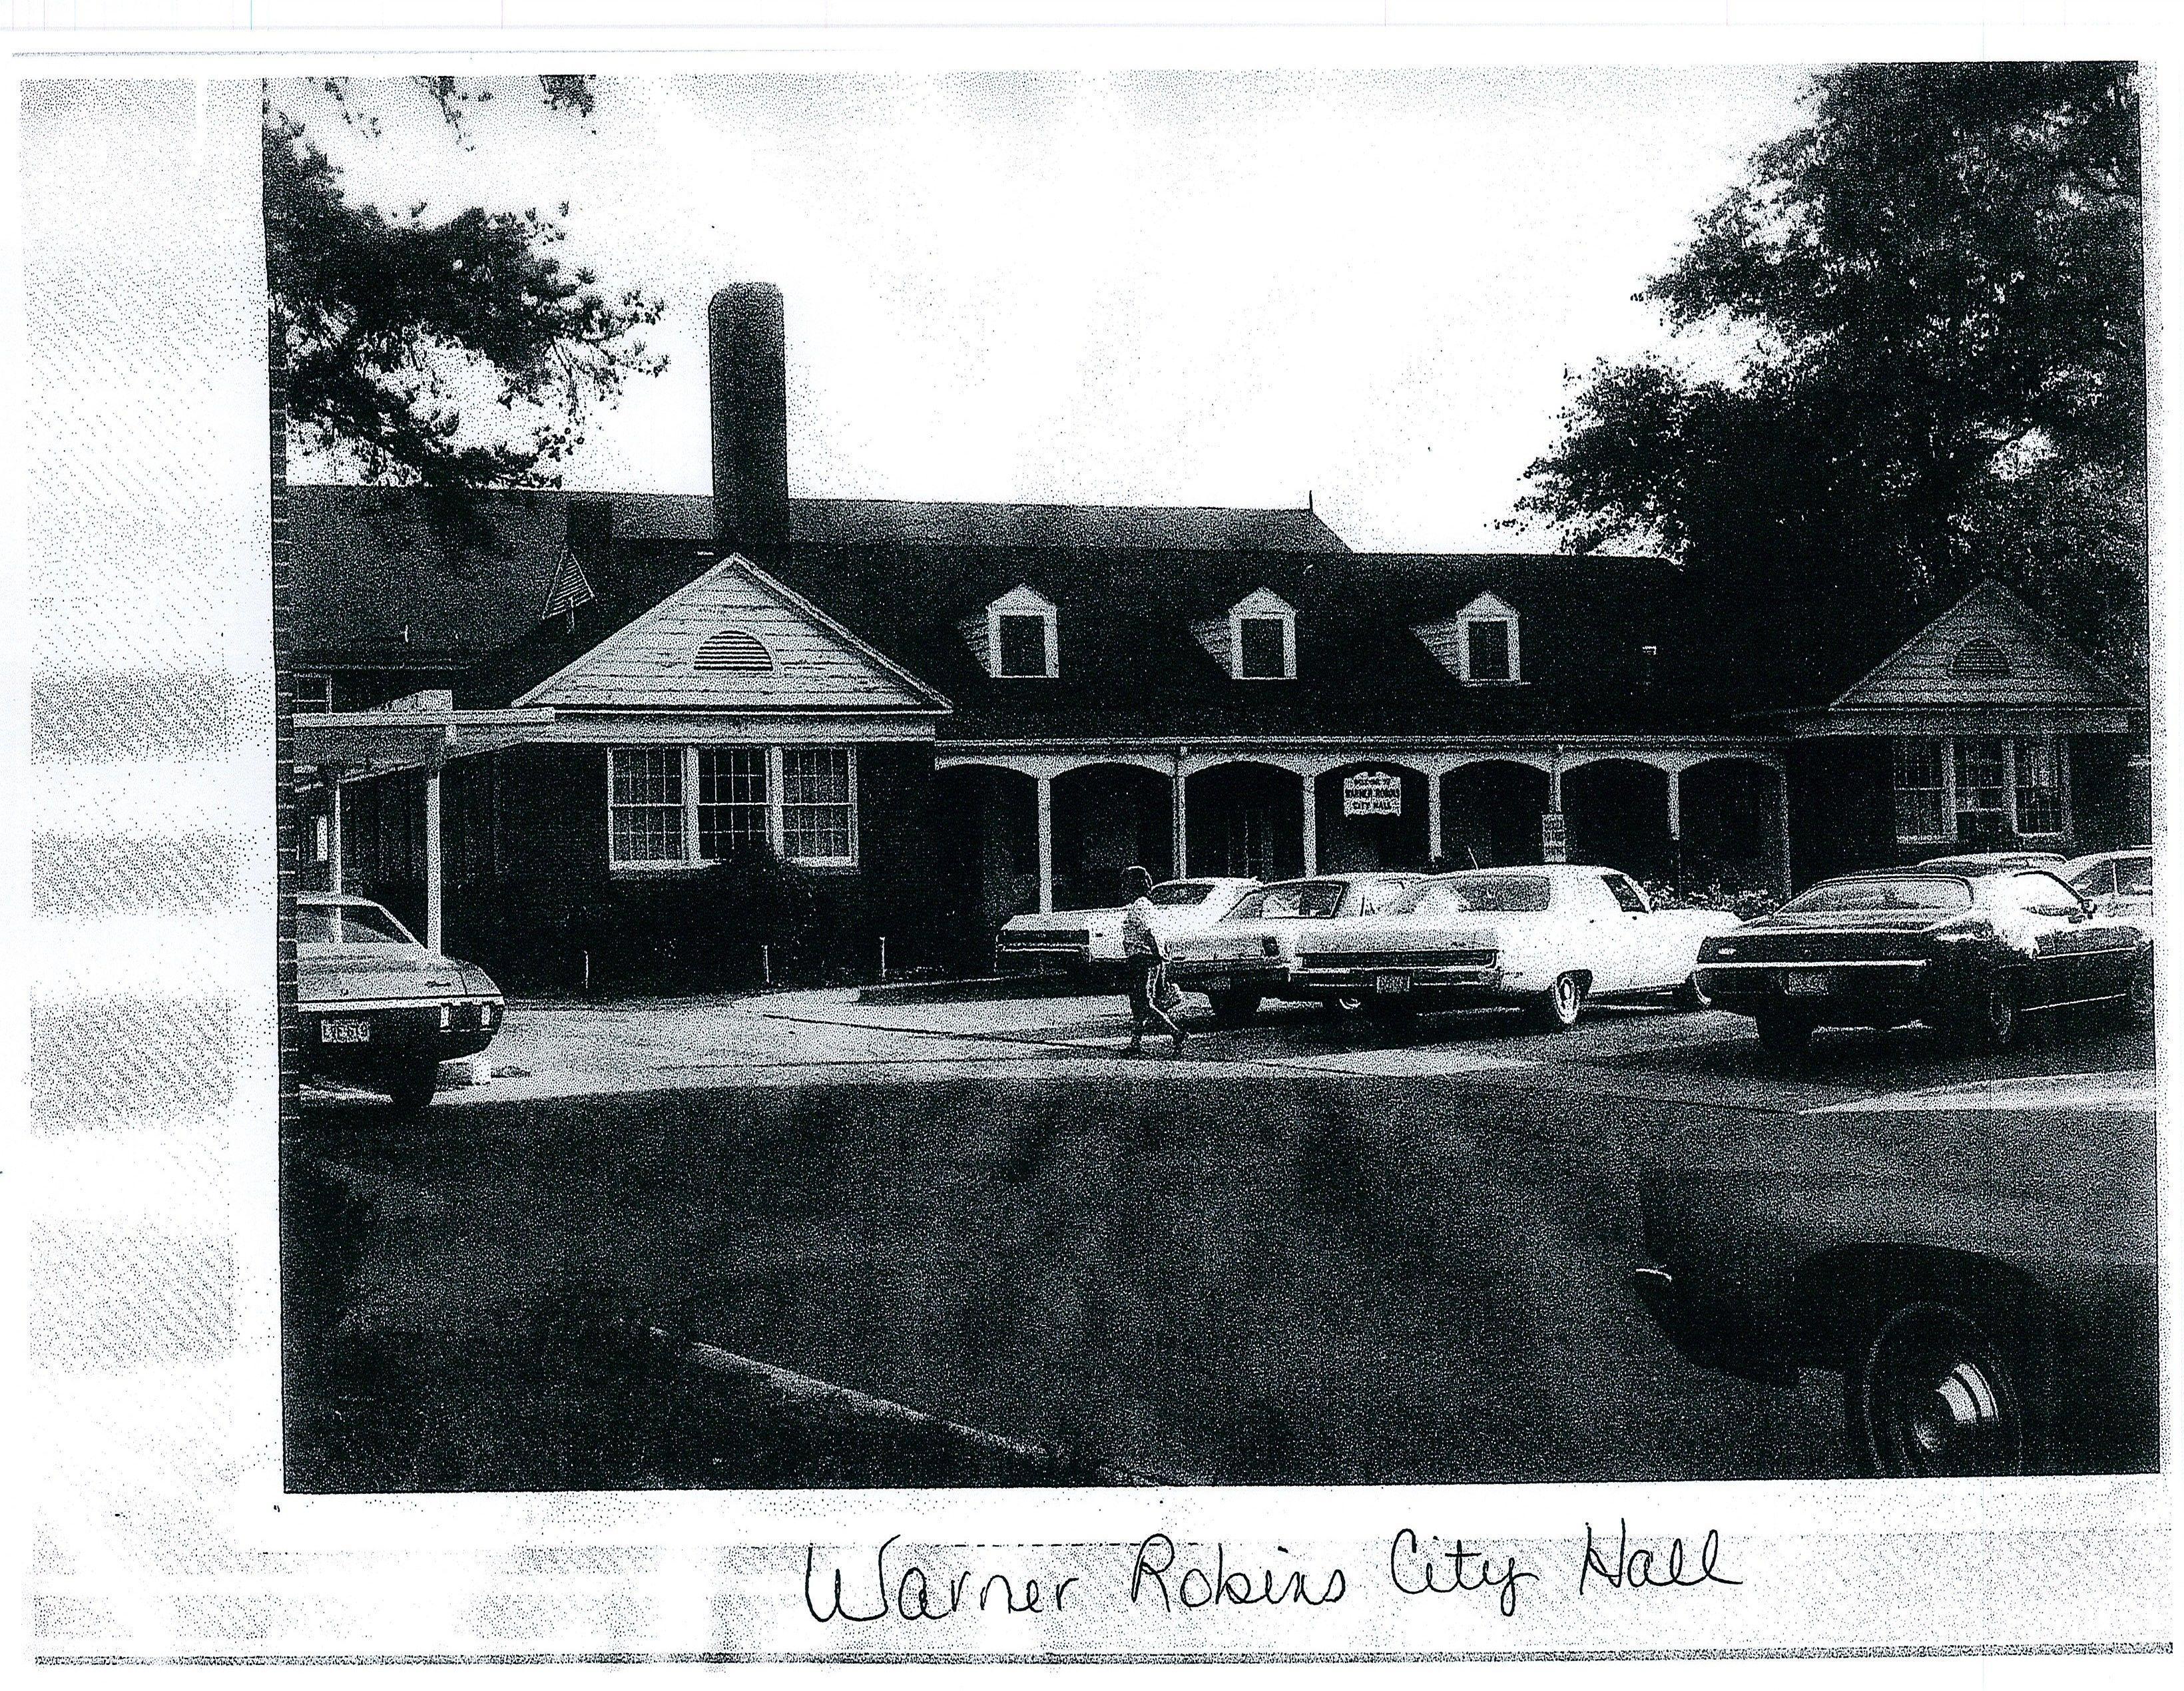 Warner Robins Warner robins, Warner, Macon